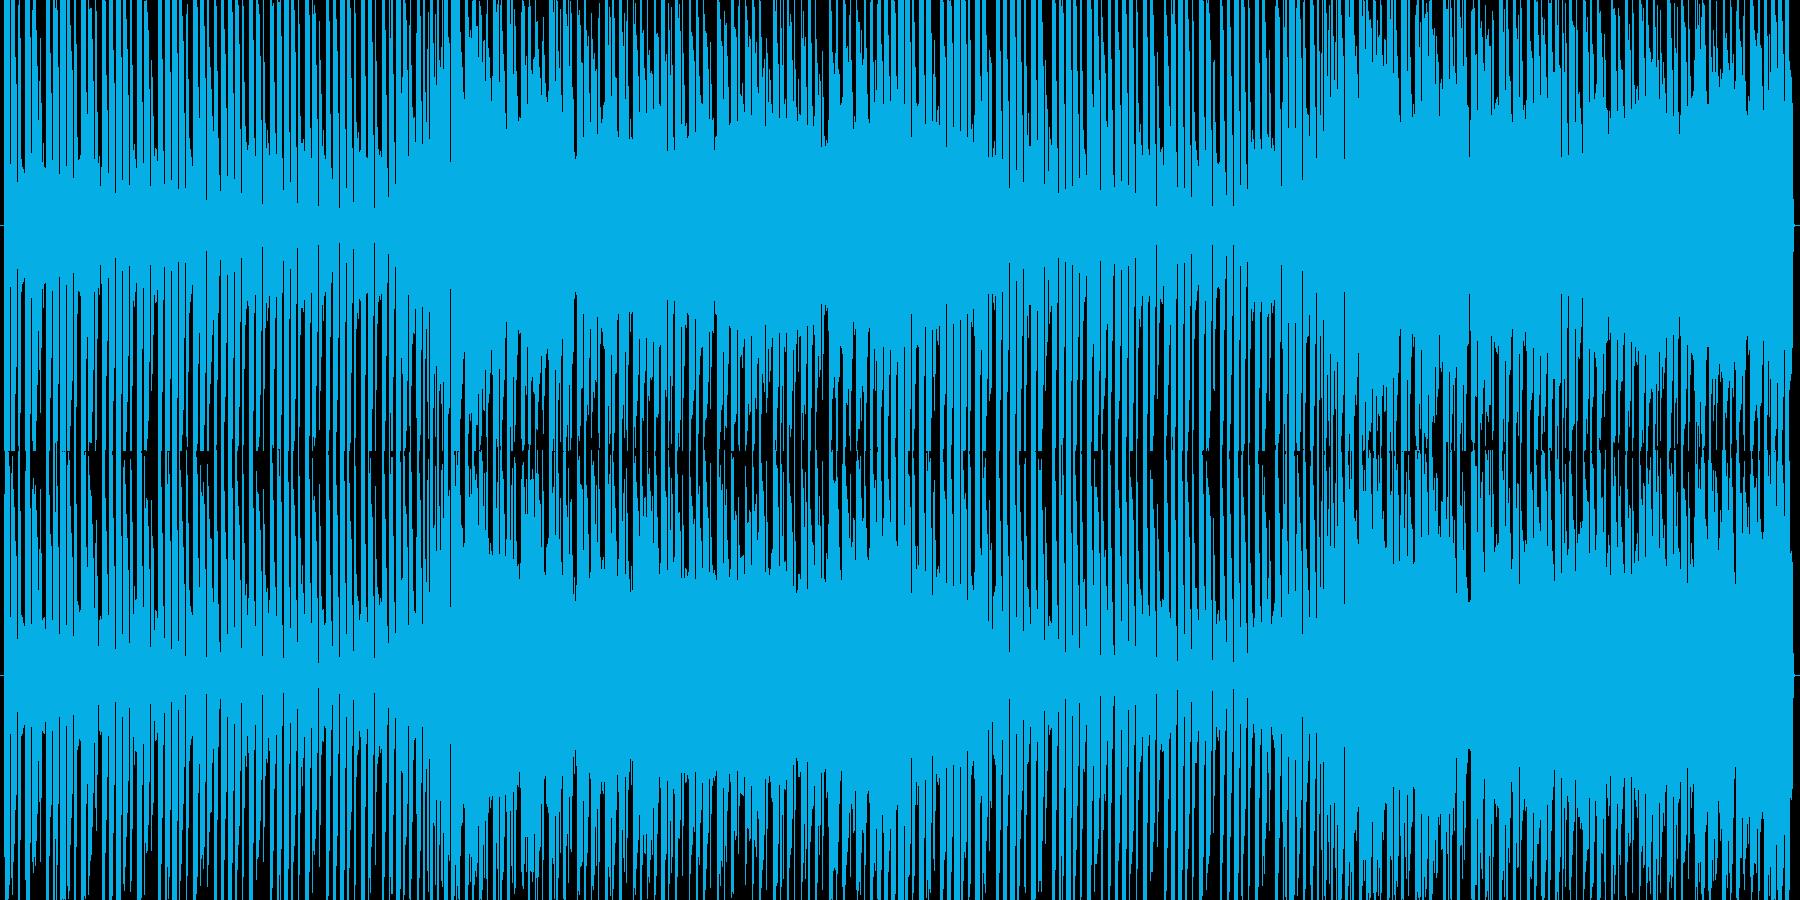 SF的でデジタル感のあるテクノトランスの再生済みの波形